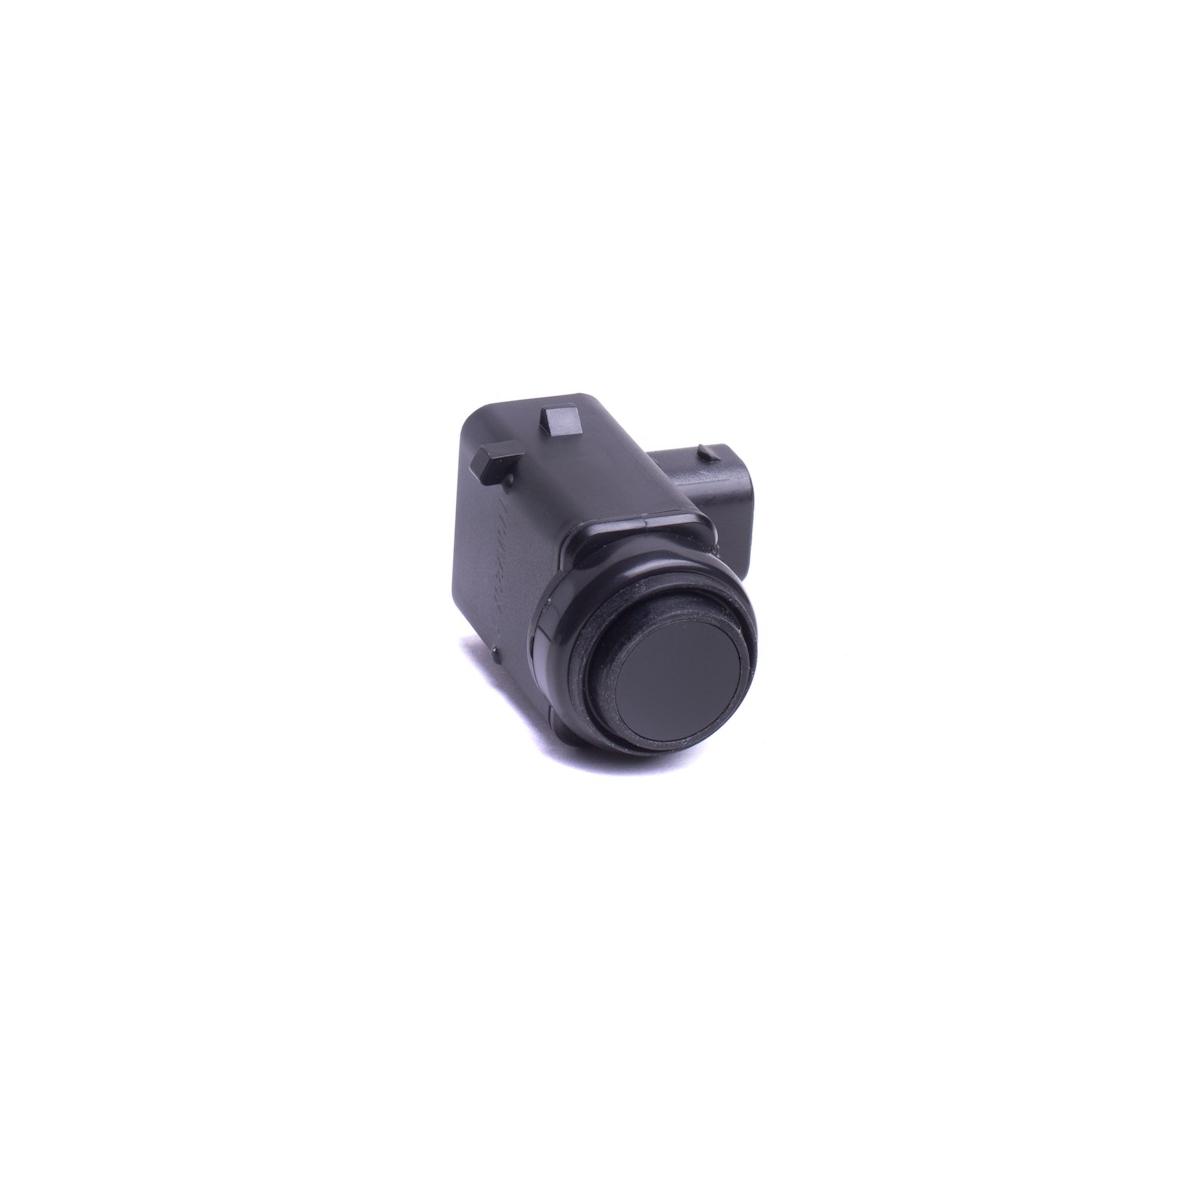 Park sensor 5HX08ZM0AA for GM, Saab, Opel, Vauxhall, JEEP, Chrysler, Porsche PDC Parktronic